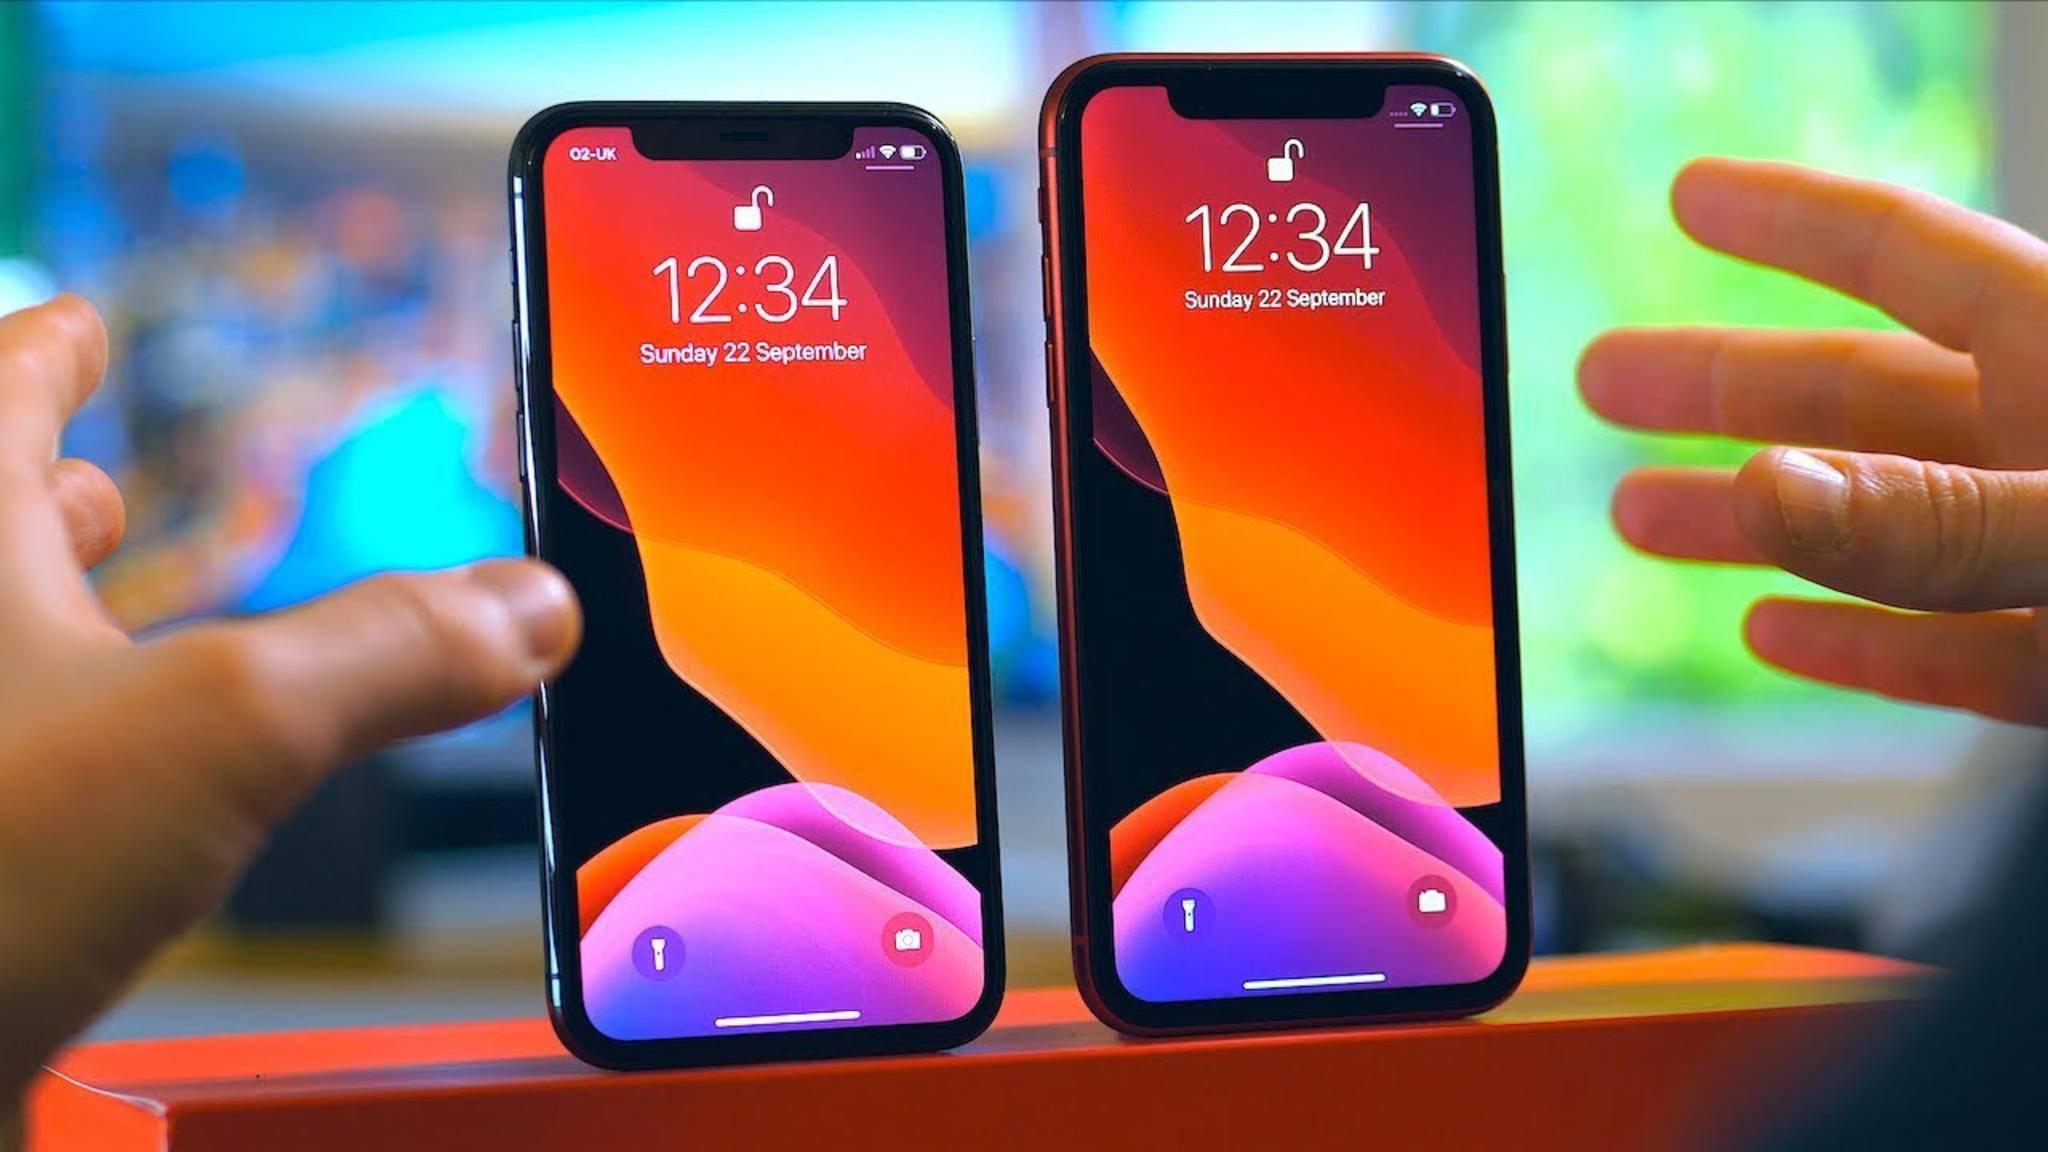 iphone-11-pro-max-display